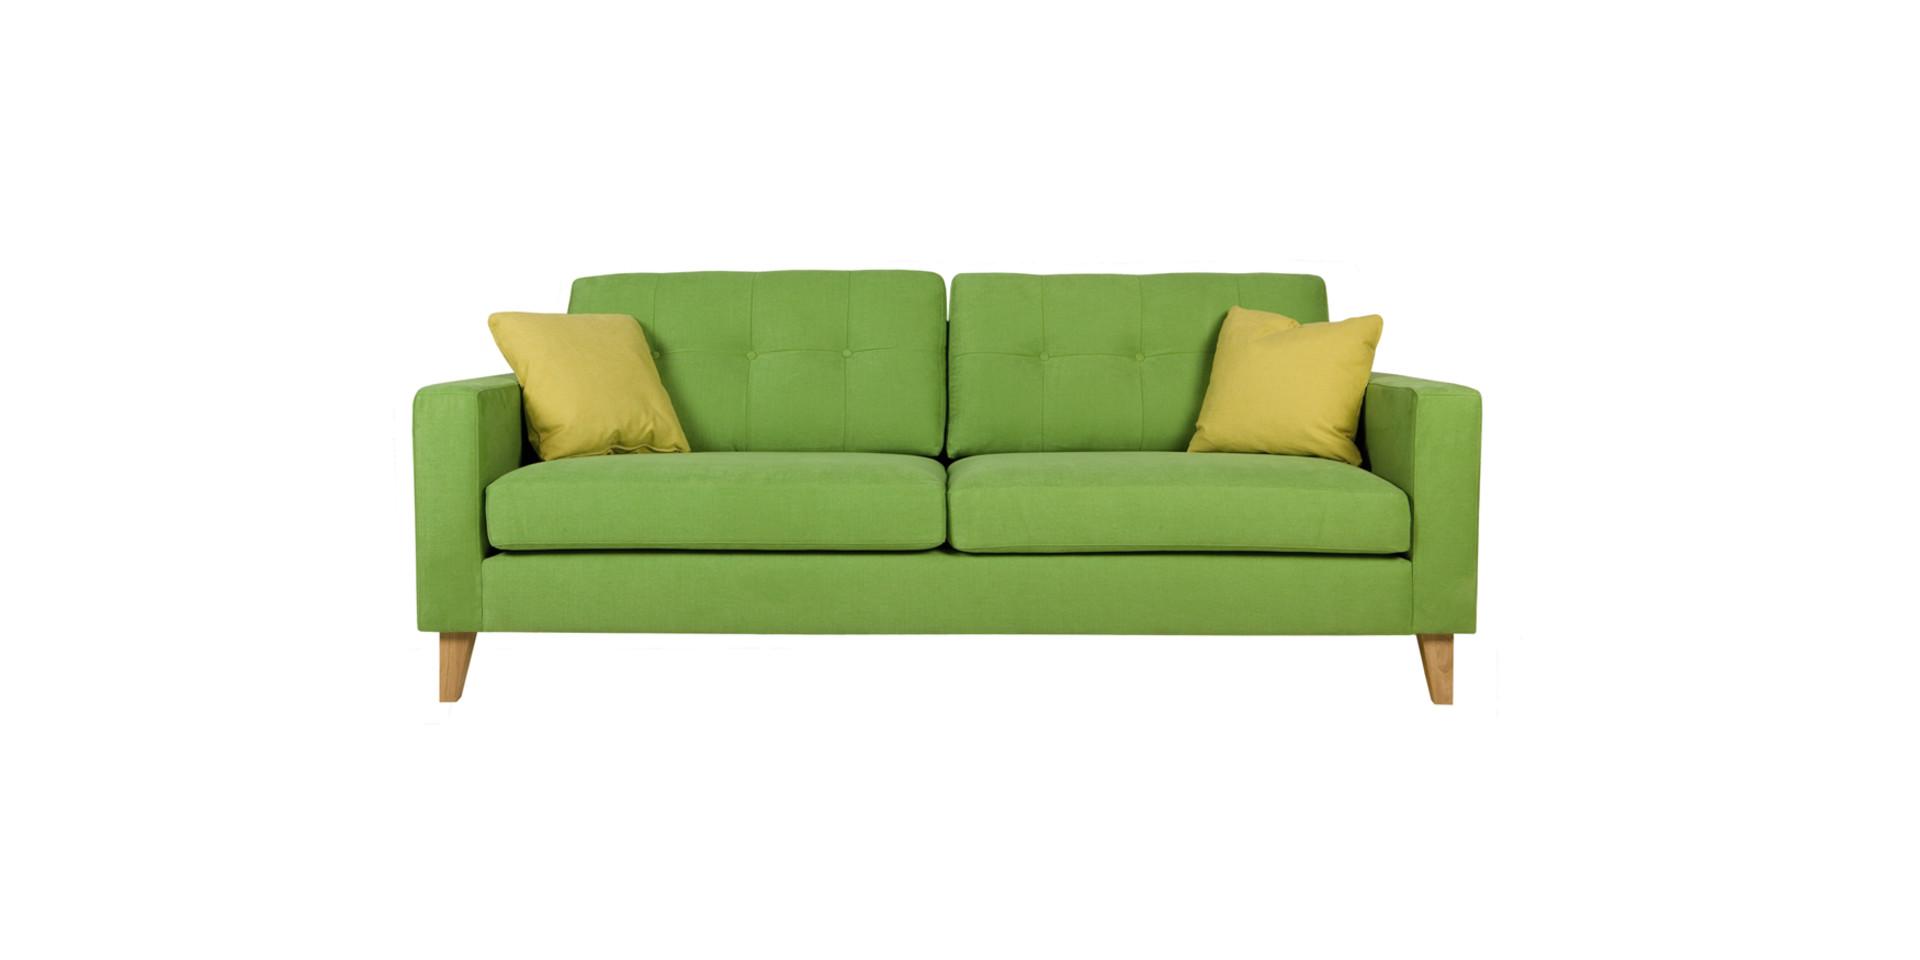 sits-giorgio-canape-3seater_caleido2895_green_1_0